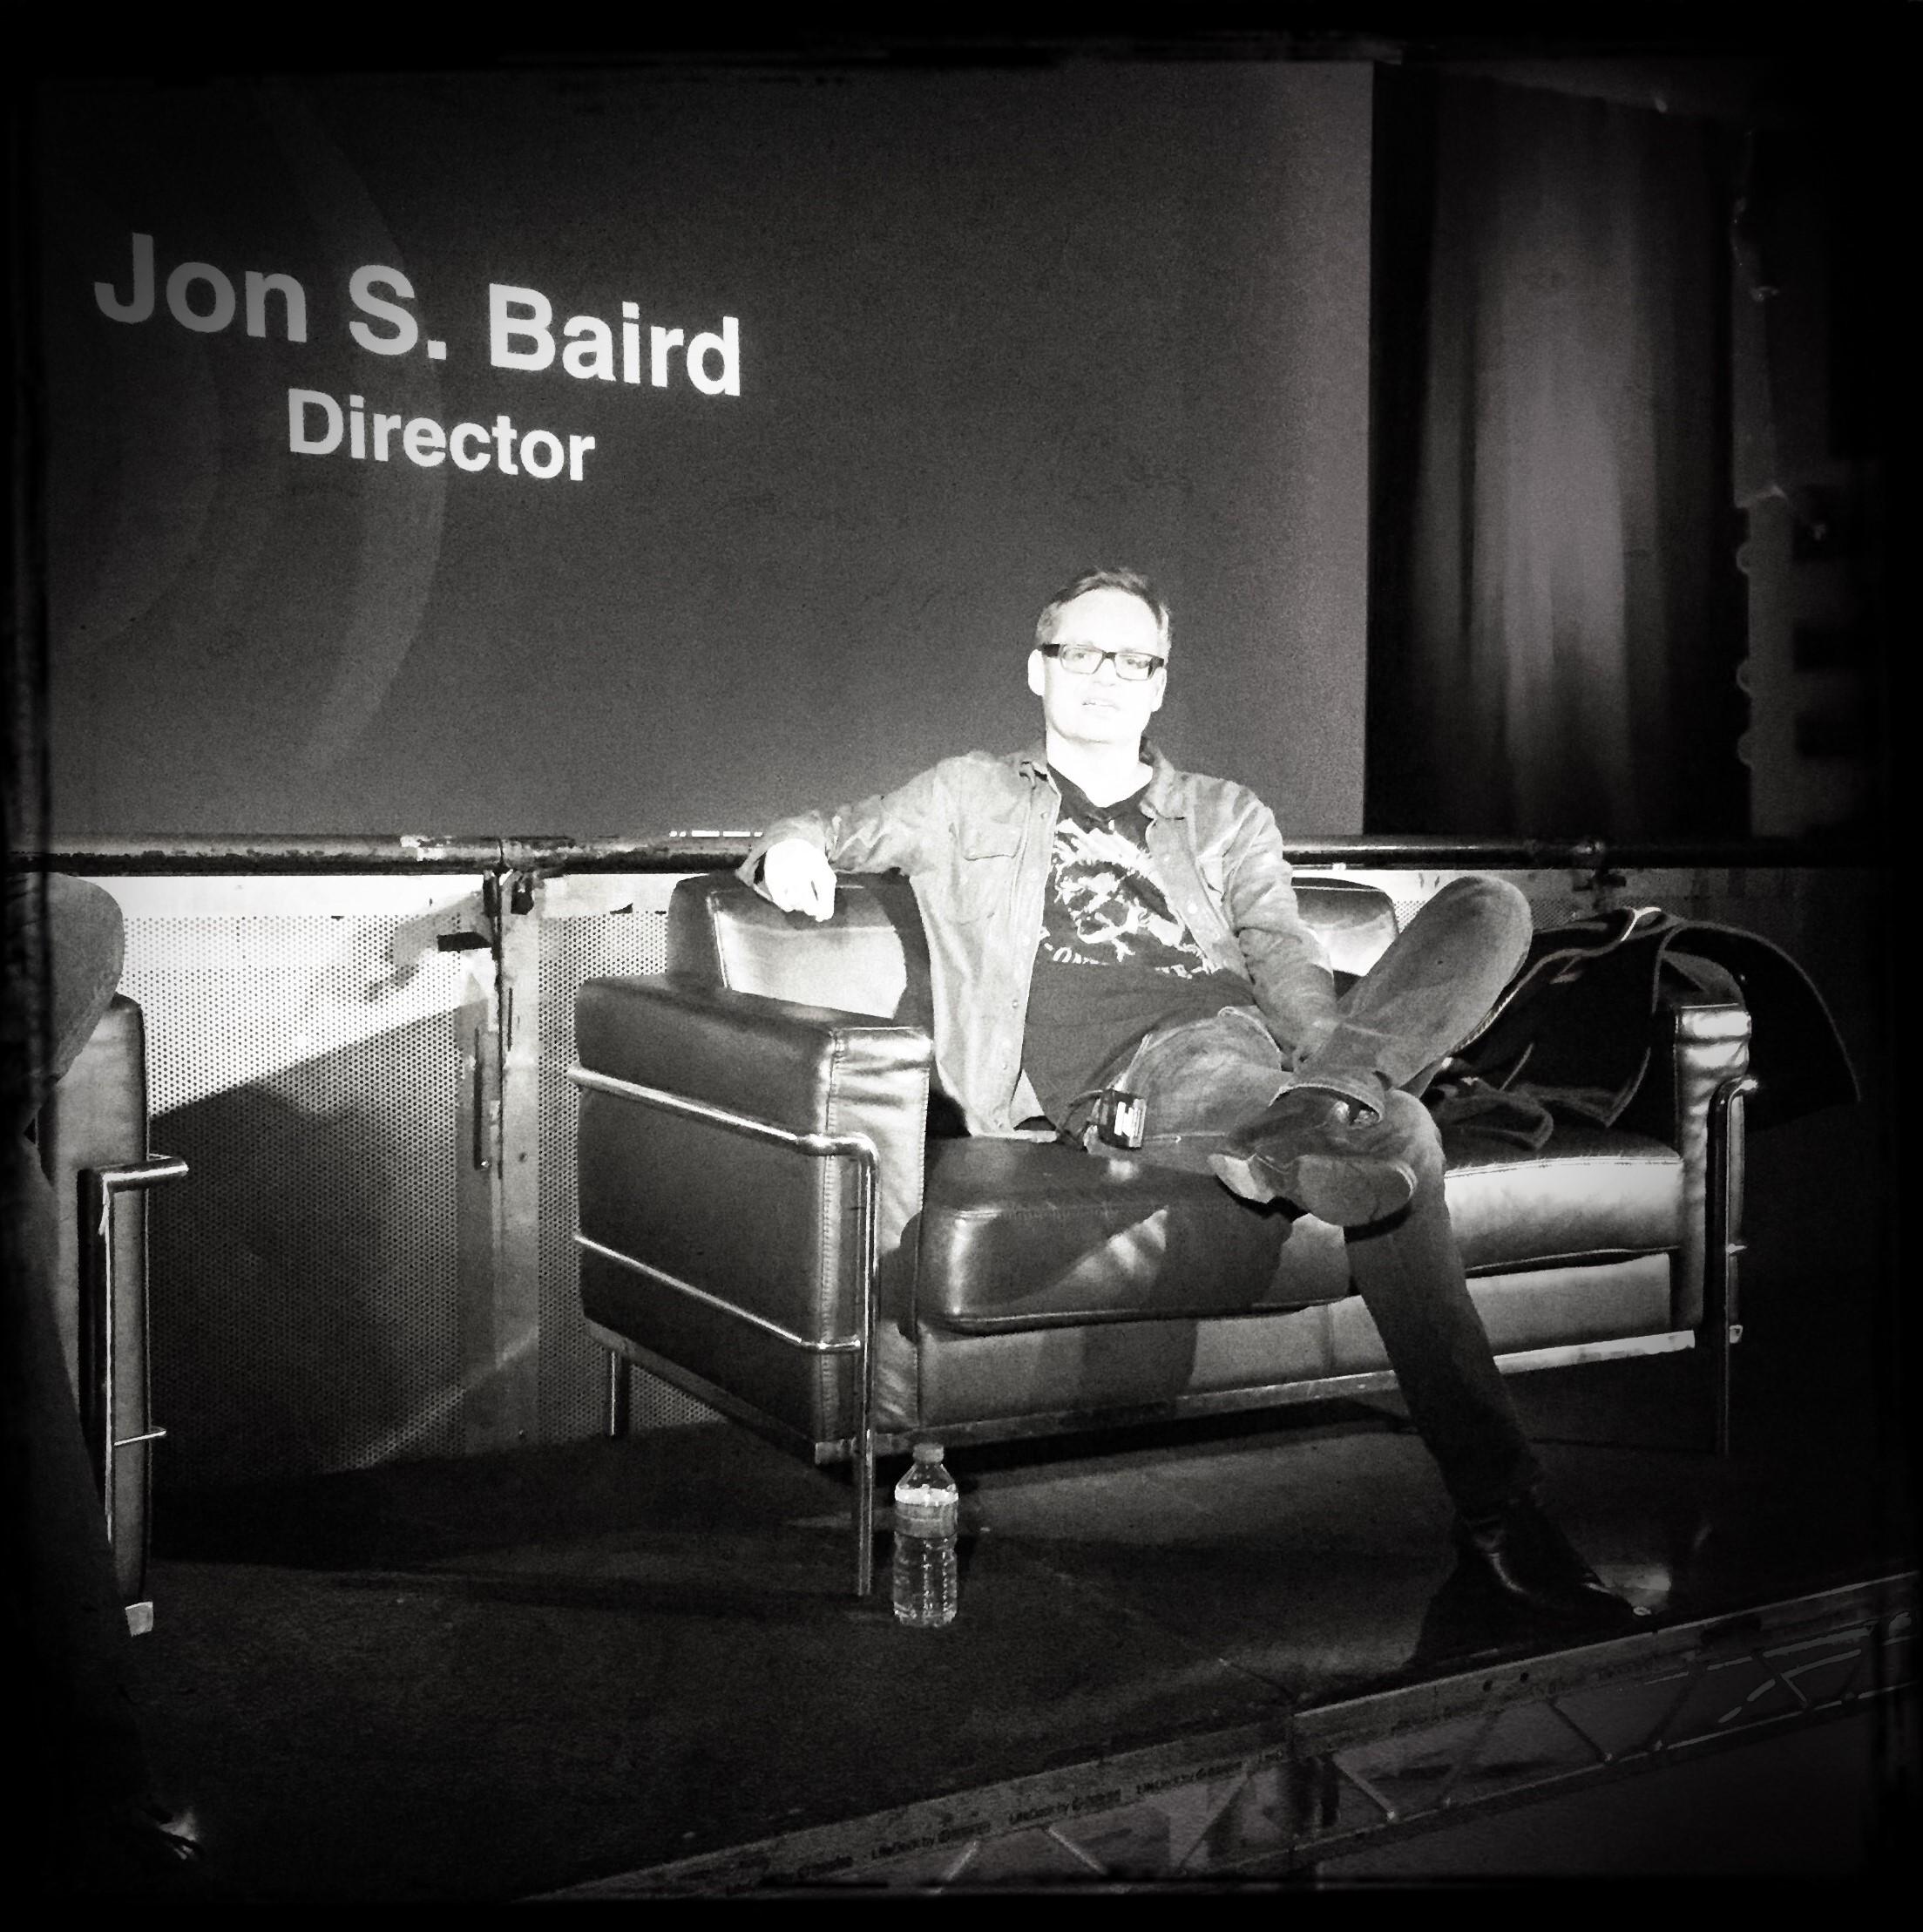 Q&A with Filth Director Jon S. Baird